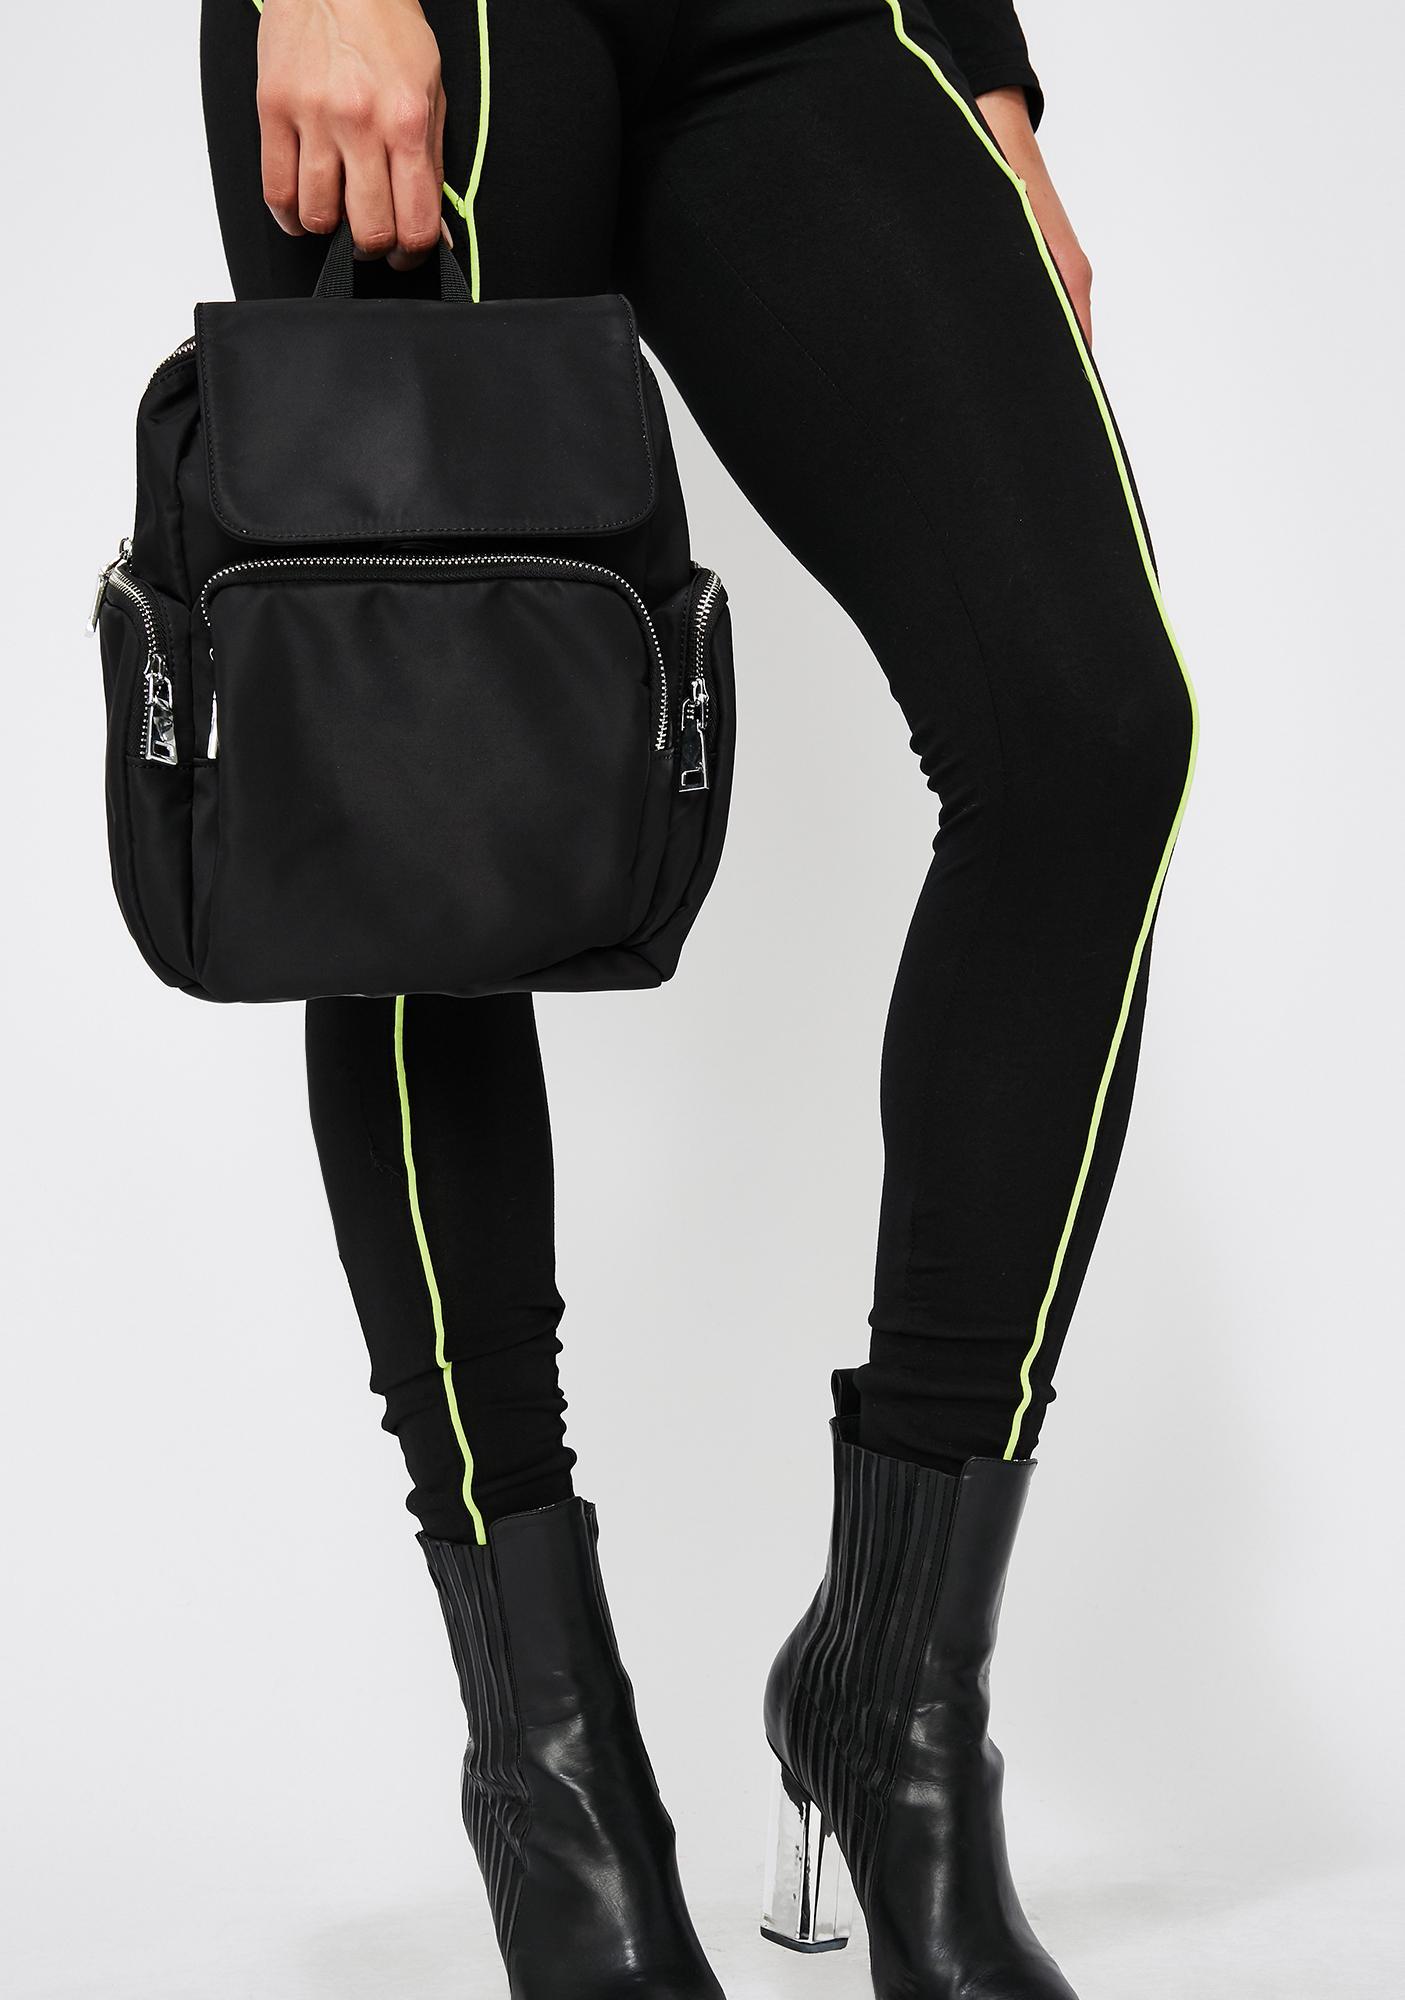 Chic Habits Mini Backpack